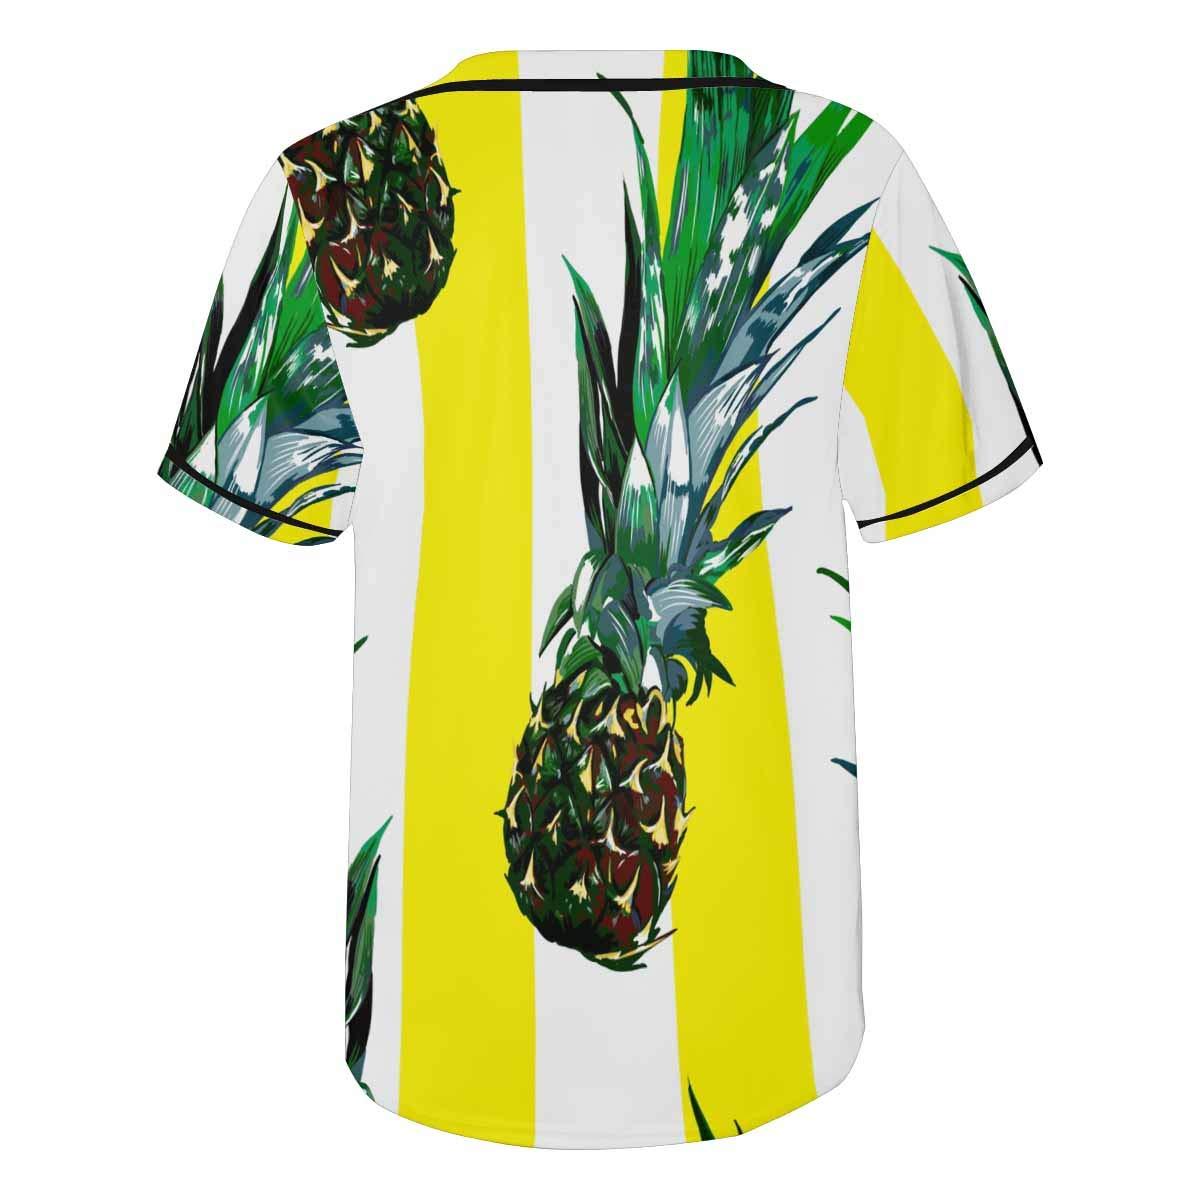 chibaokun Summer Fruits Unisex-Child T Shirt Baby Toddler Tee Round-Neck Short Sleeve Shirt